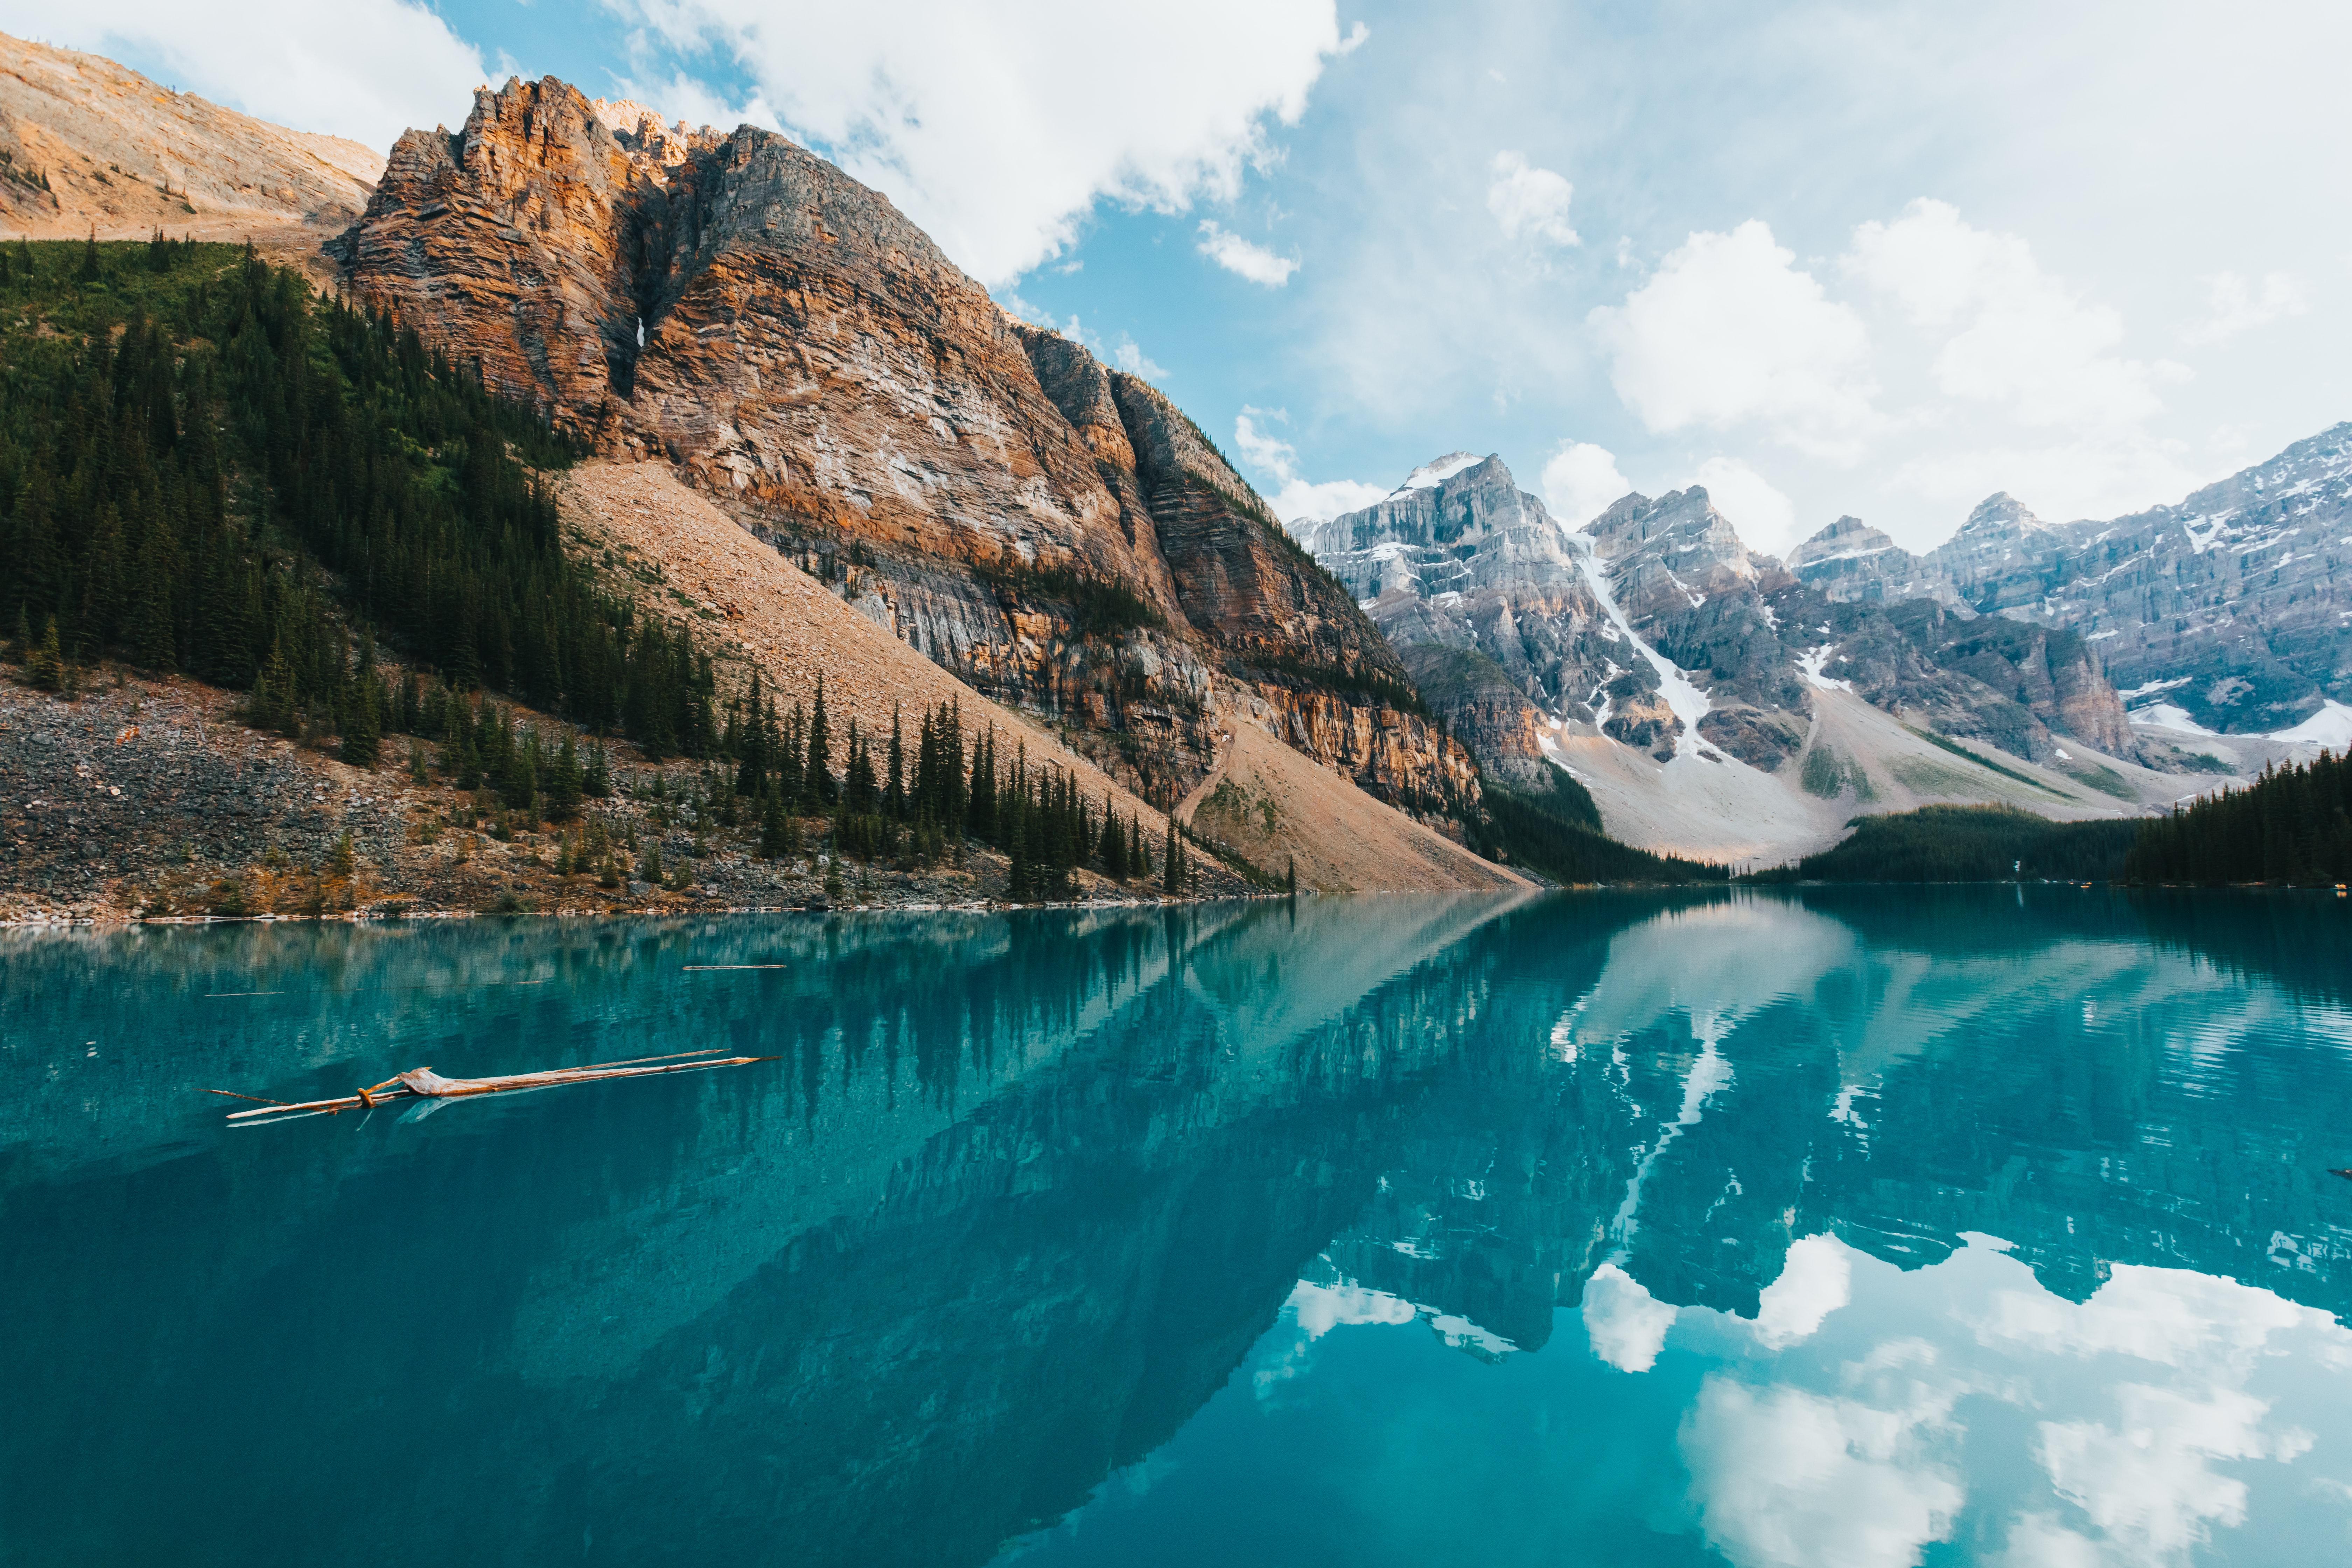 General 6720x4480 landscape nature mountains reflection Banff National Park